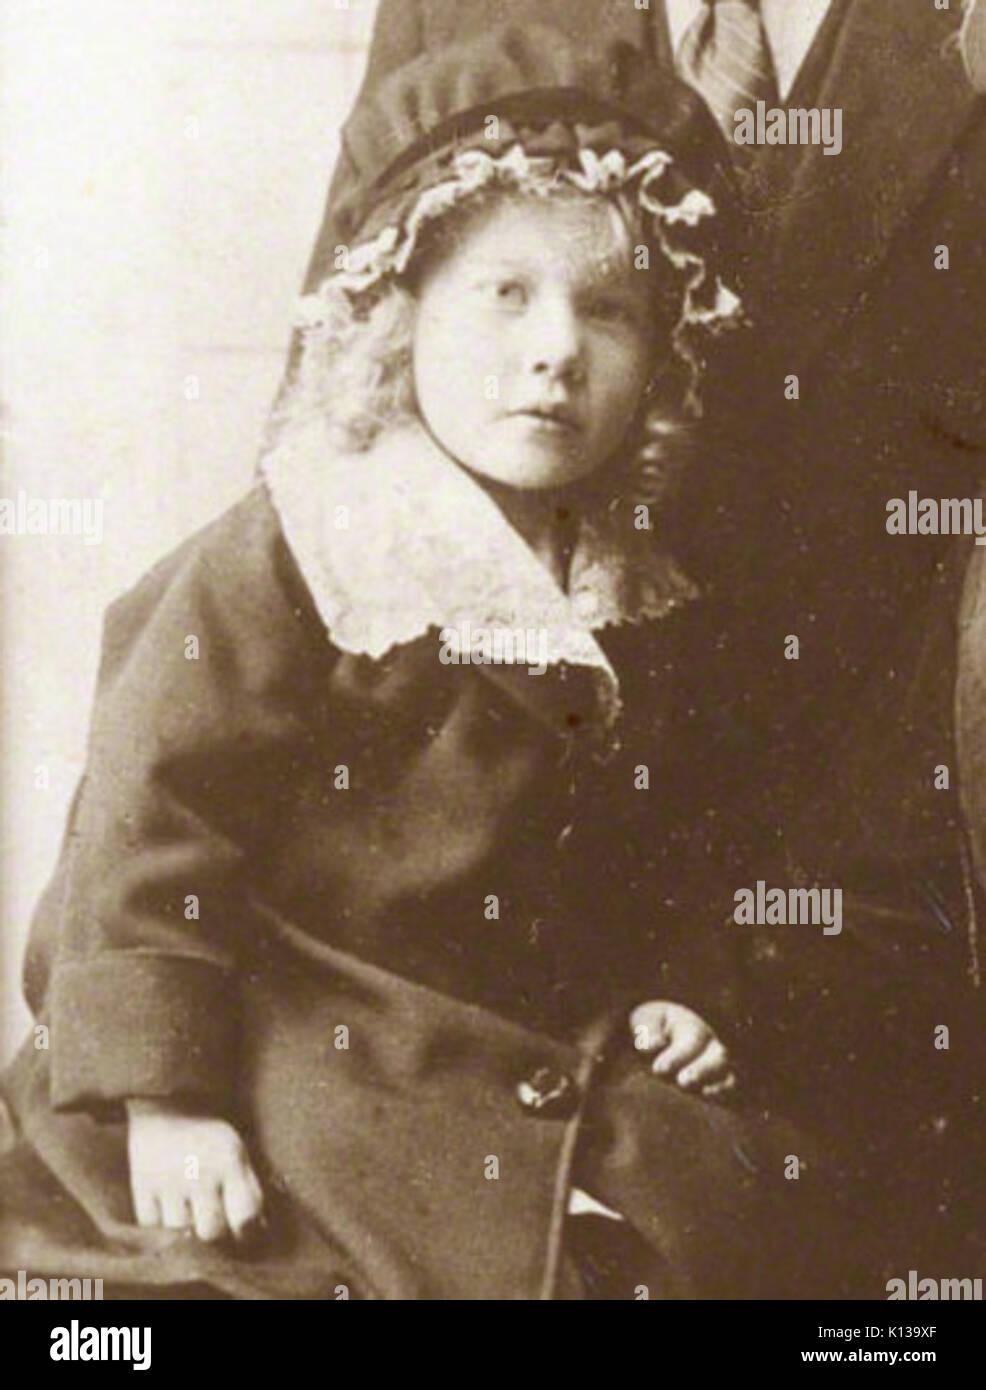 Alfie Fripp Photo Stock